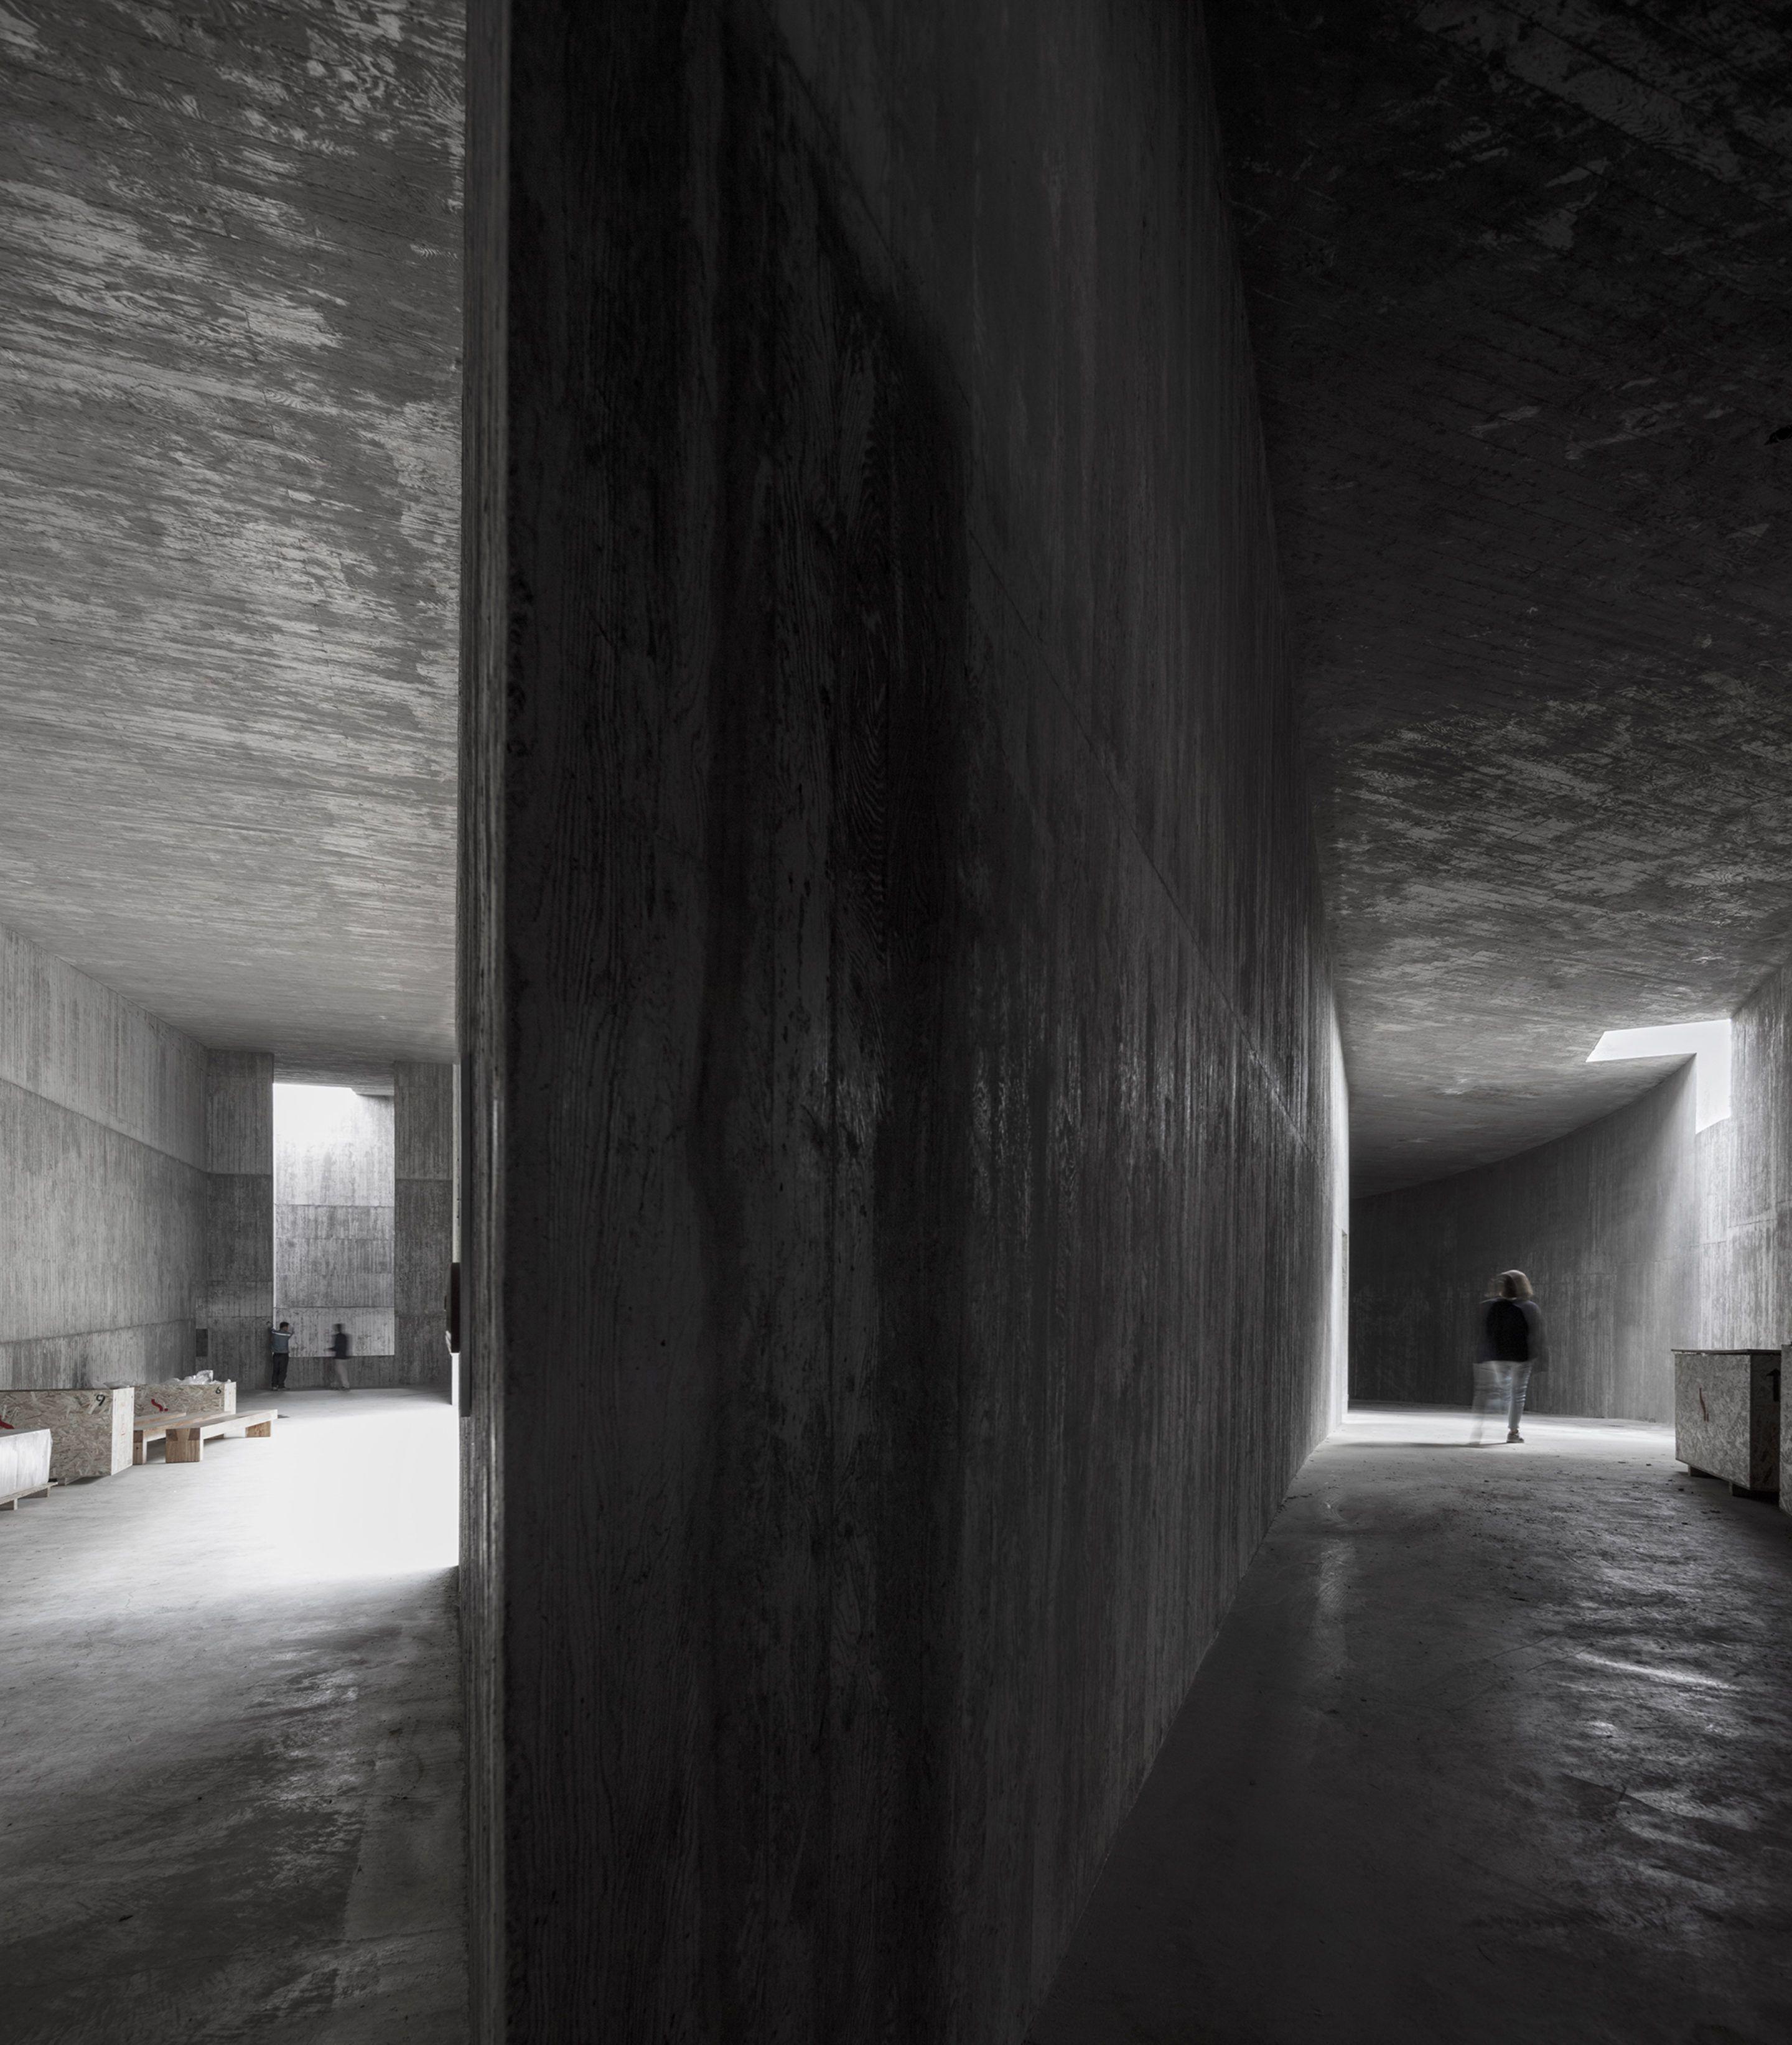 IGNANT-Architecture-Alvaro-Siza-Carlos-Castanheira-Art-Pavilion-Photographs-18